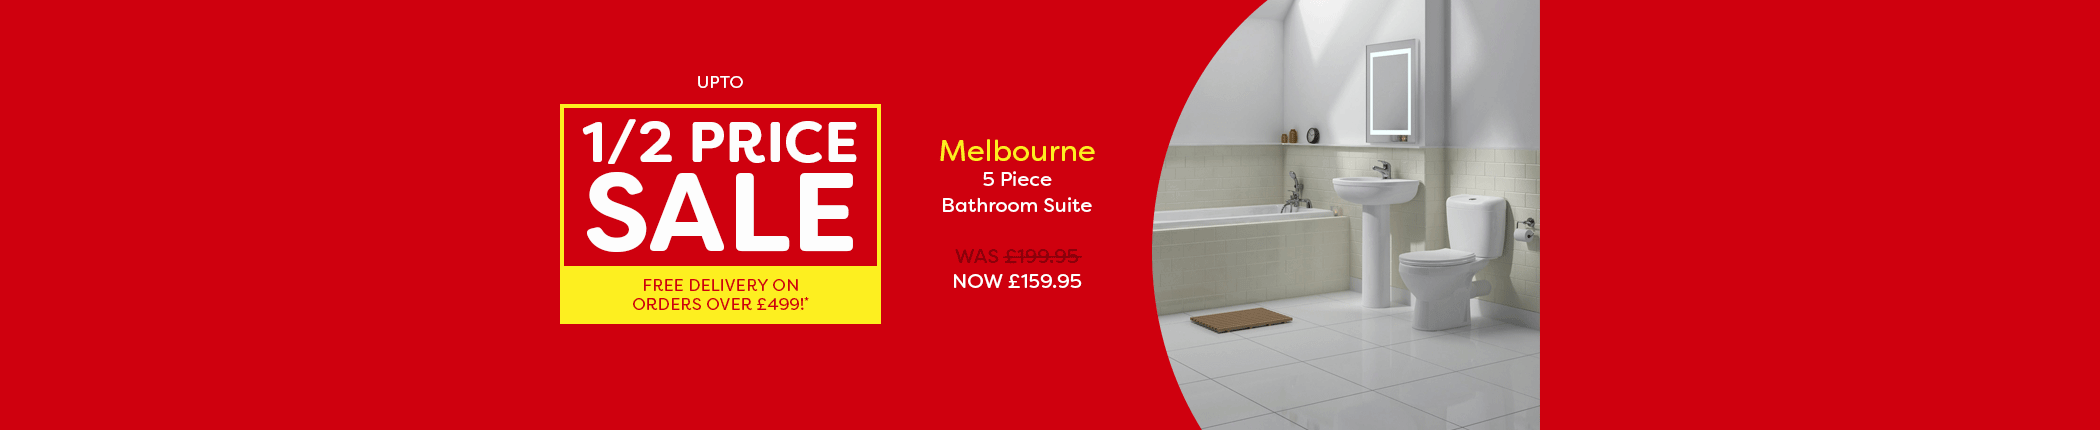 half-price-sale-melbourne-5-piece-bathroom-suite-499-apr17-hbnr